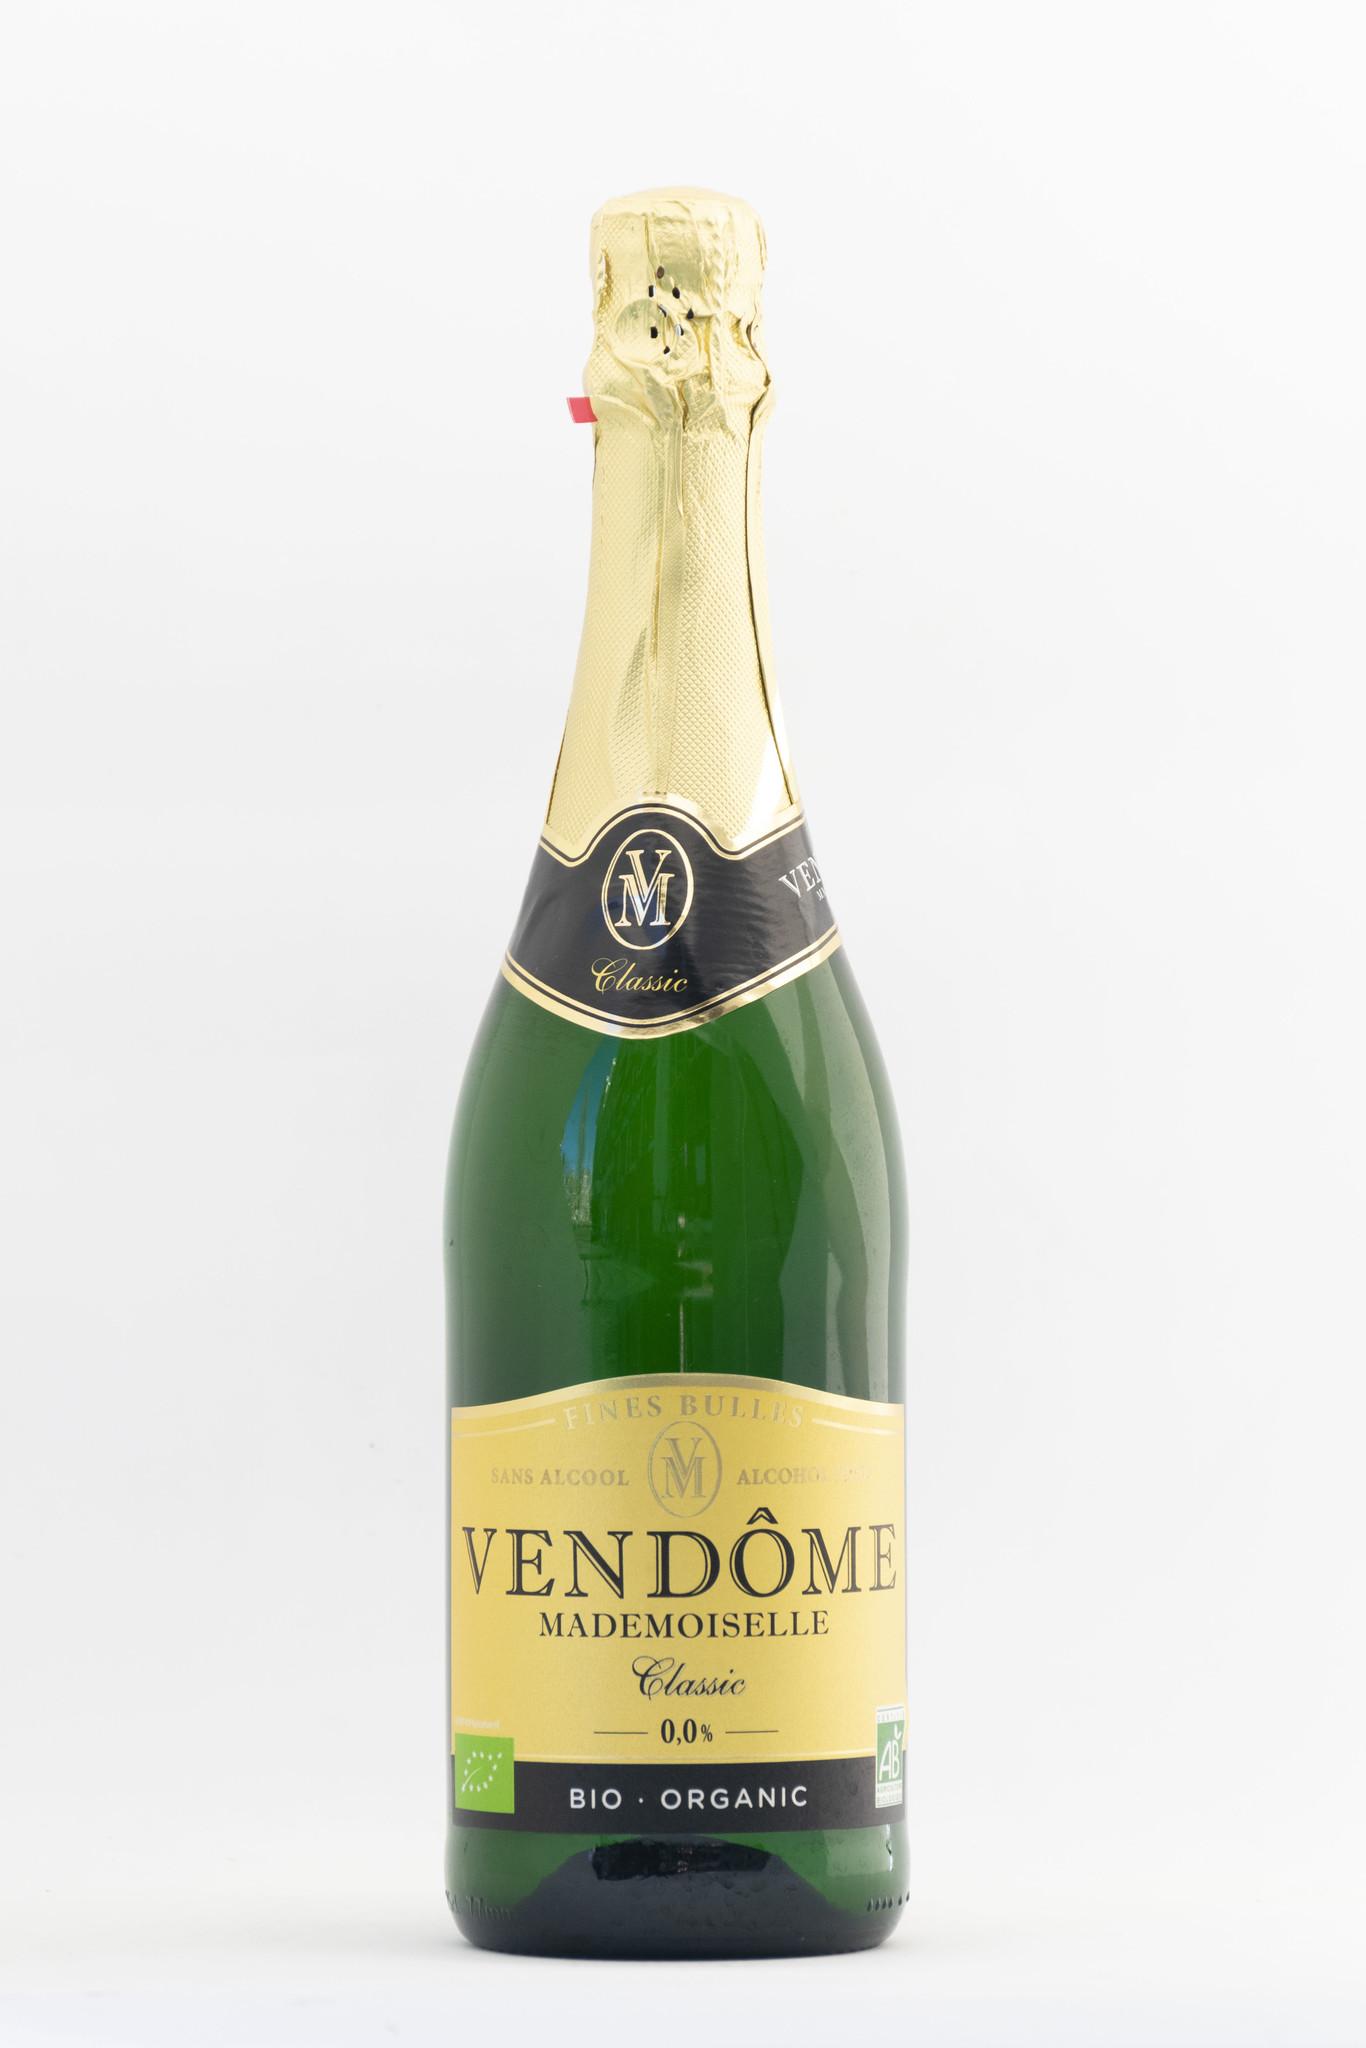 Vendôme| Mademoiselle | Classic| Mini| 0% Alc.